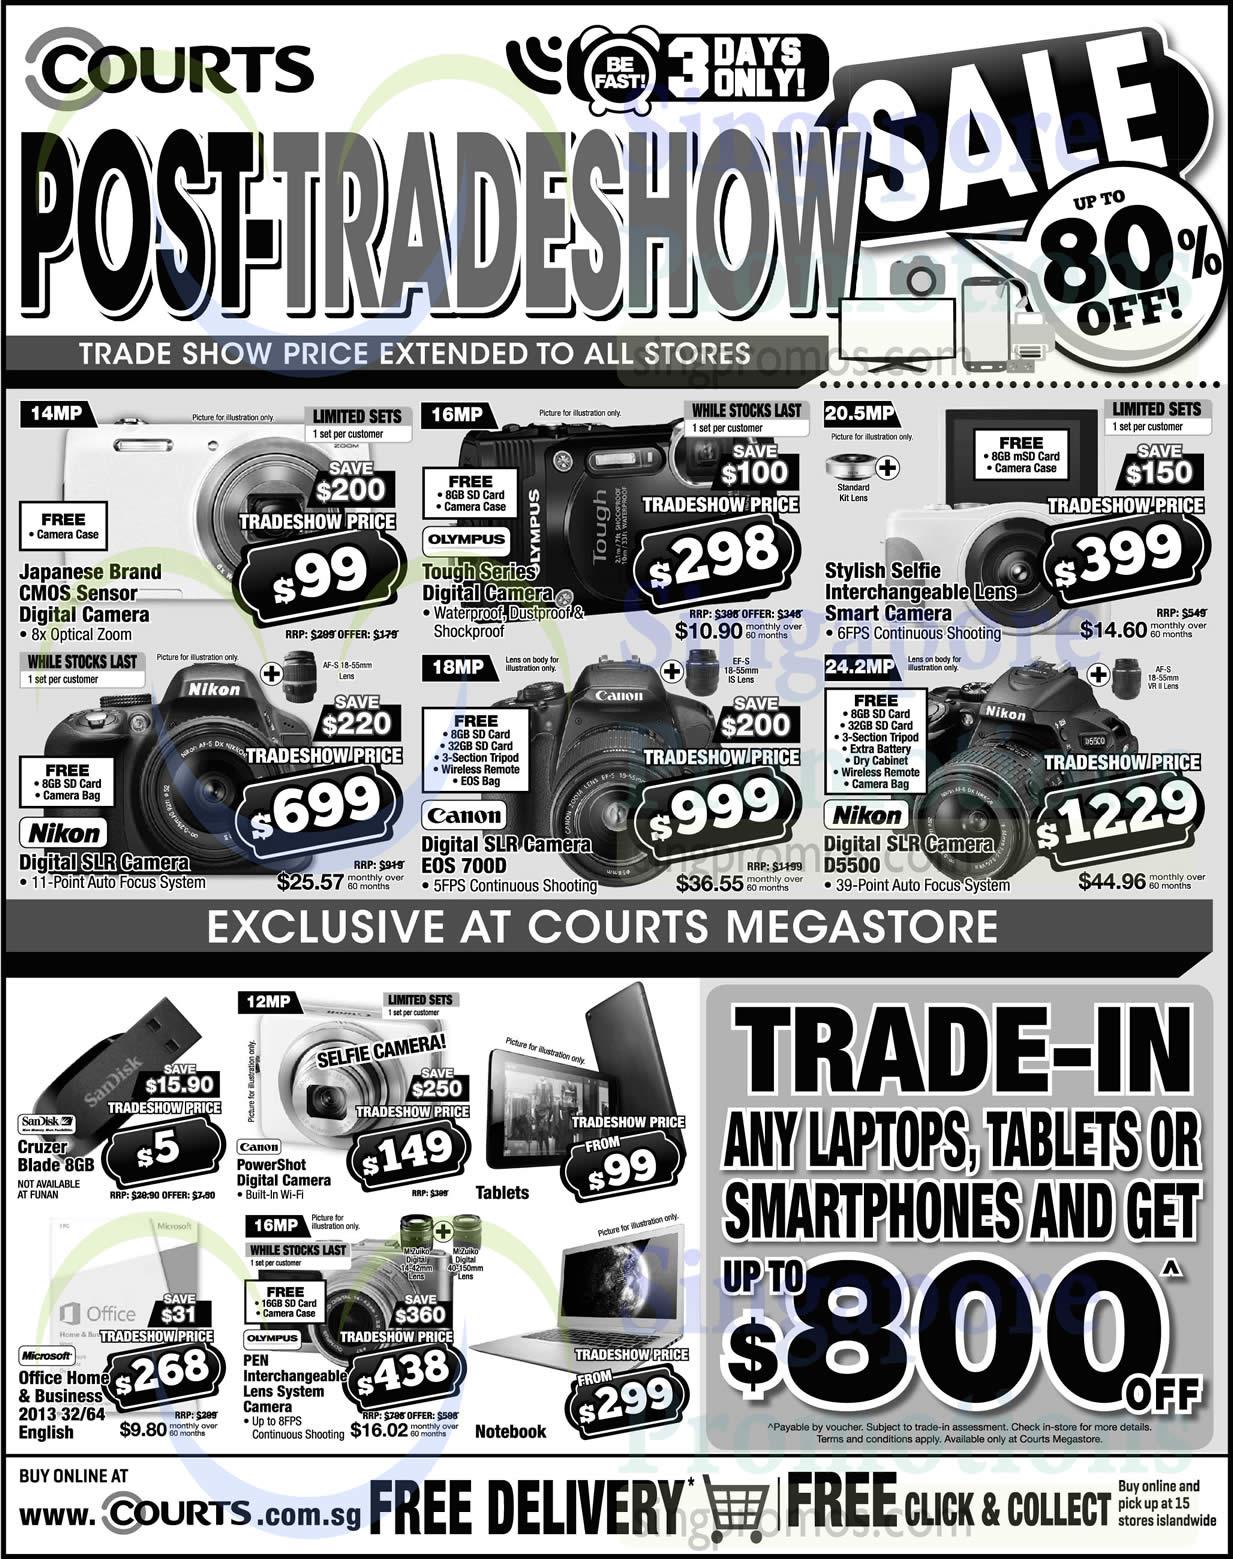 Canon EOS700D DSLR Digital Camera, Nikon D5500 DSLR Digital Camera, Microsoft Office Home & Business 2013 32/64 English